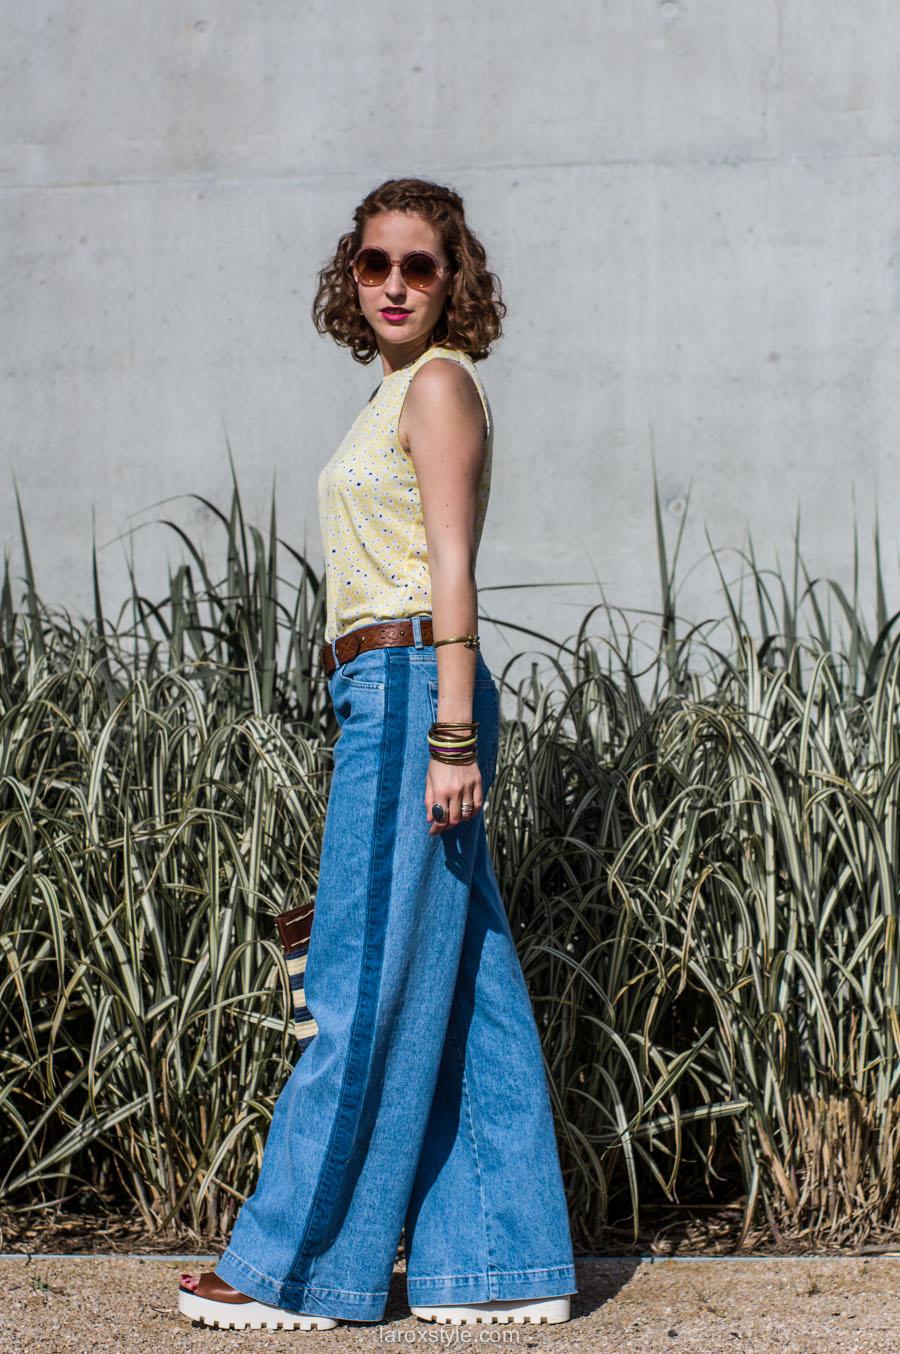 laroxstyle - blog mode lyon - look 70s - pantalon patte d elephant (6 sur 44)